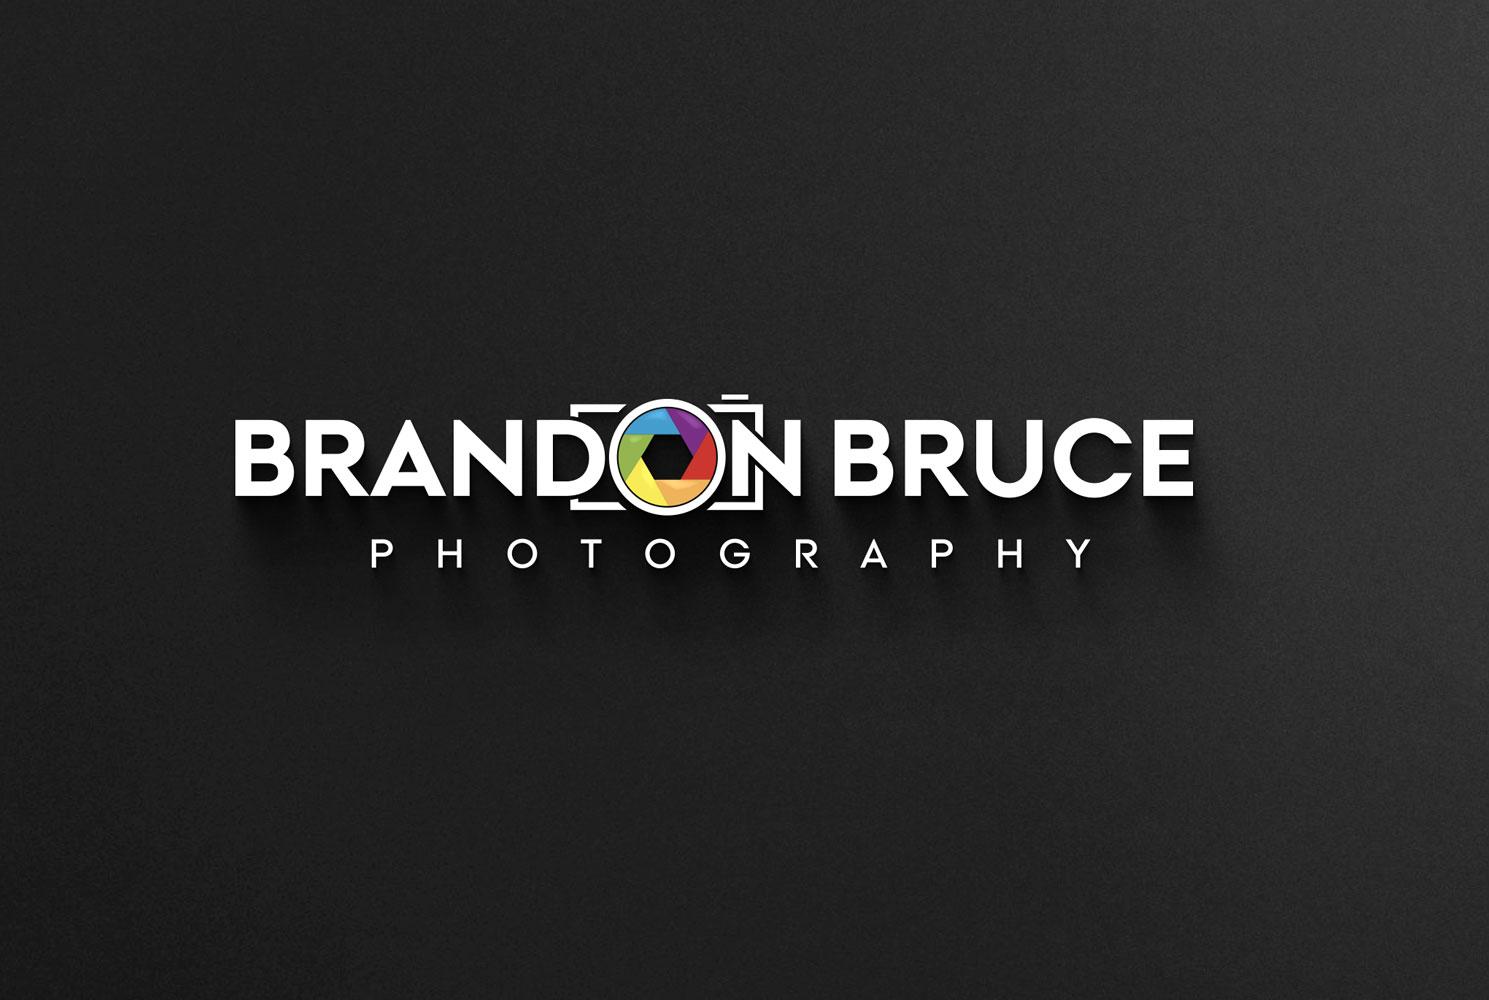 Brandon Bruce Photography floor plan in Canberra